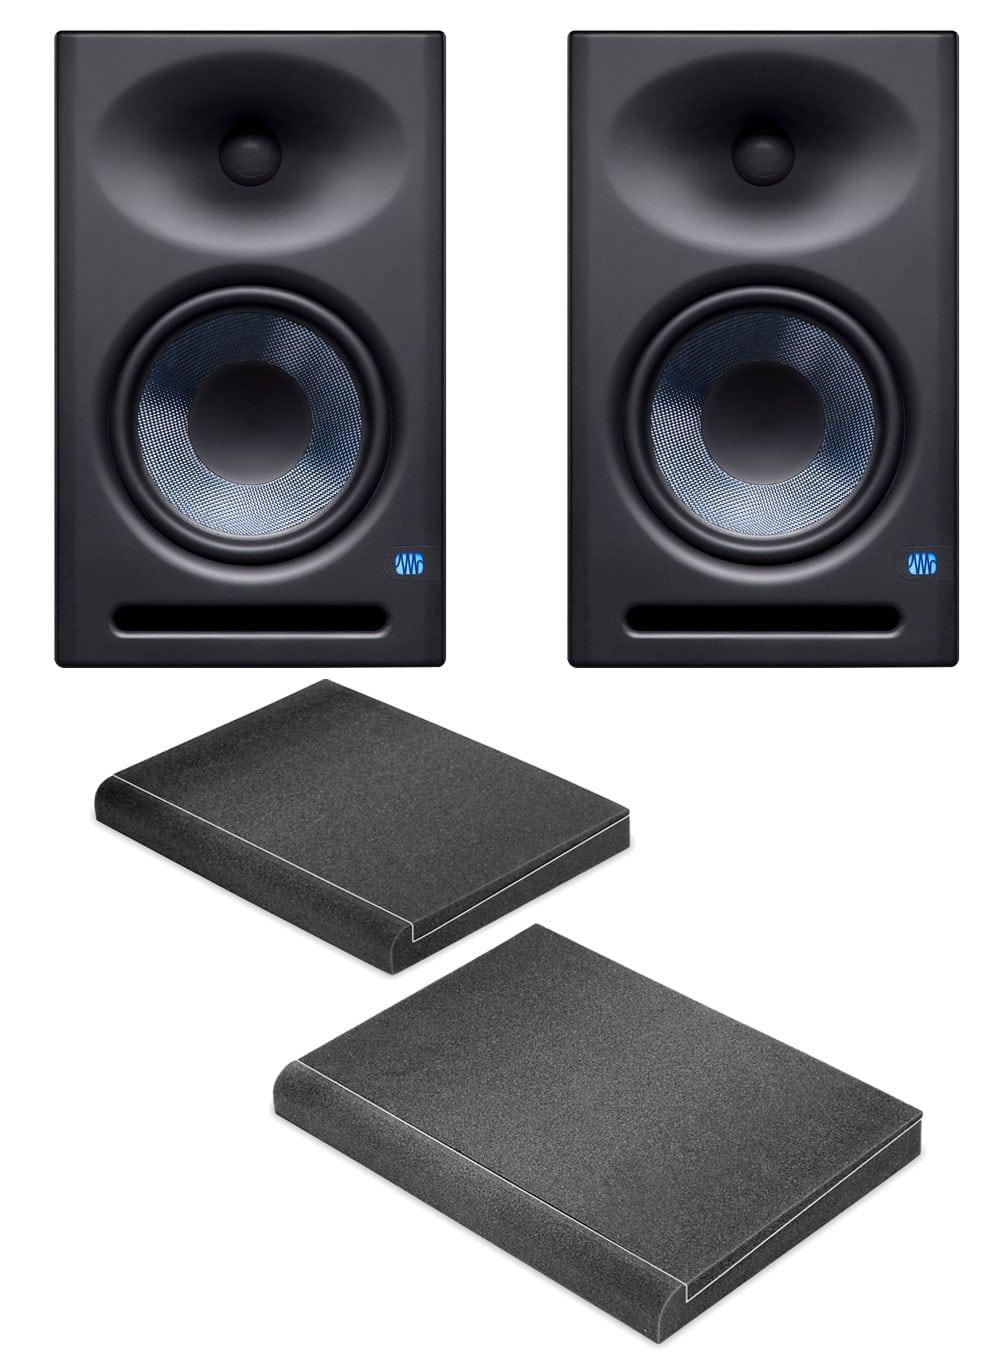 Studiomonitore - Presonus Eris E8 XT Aktives Studiomonitor Paar inkl. Absorberplatten - Onlineshop Musikhaus Kirstein